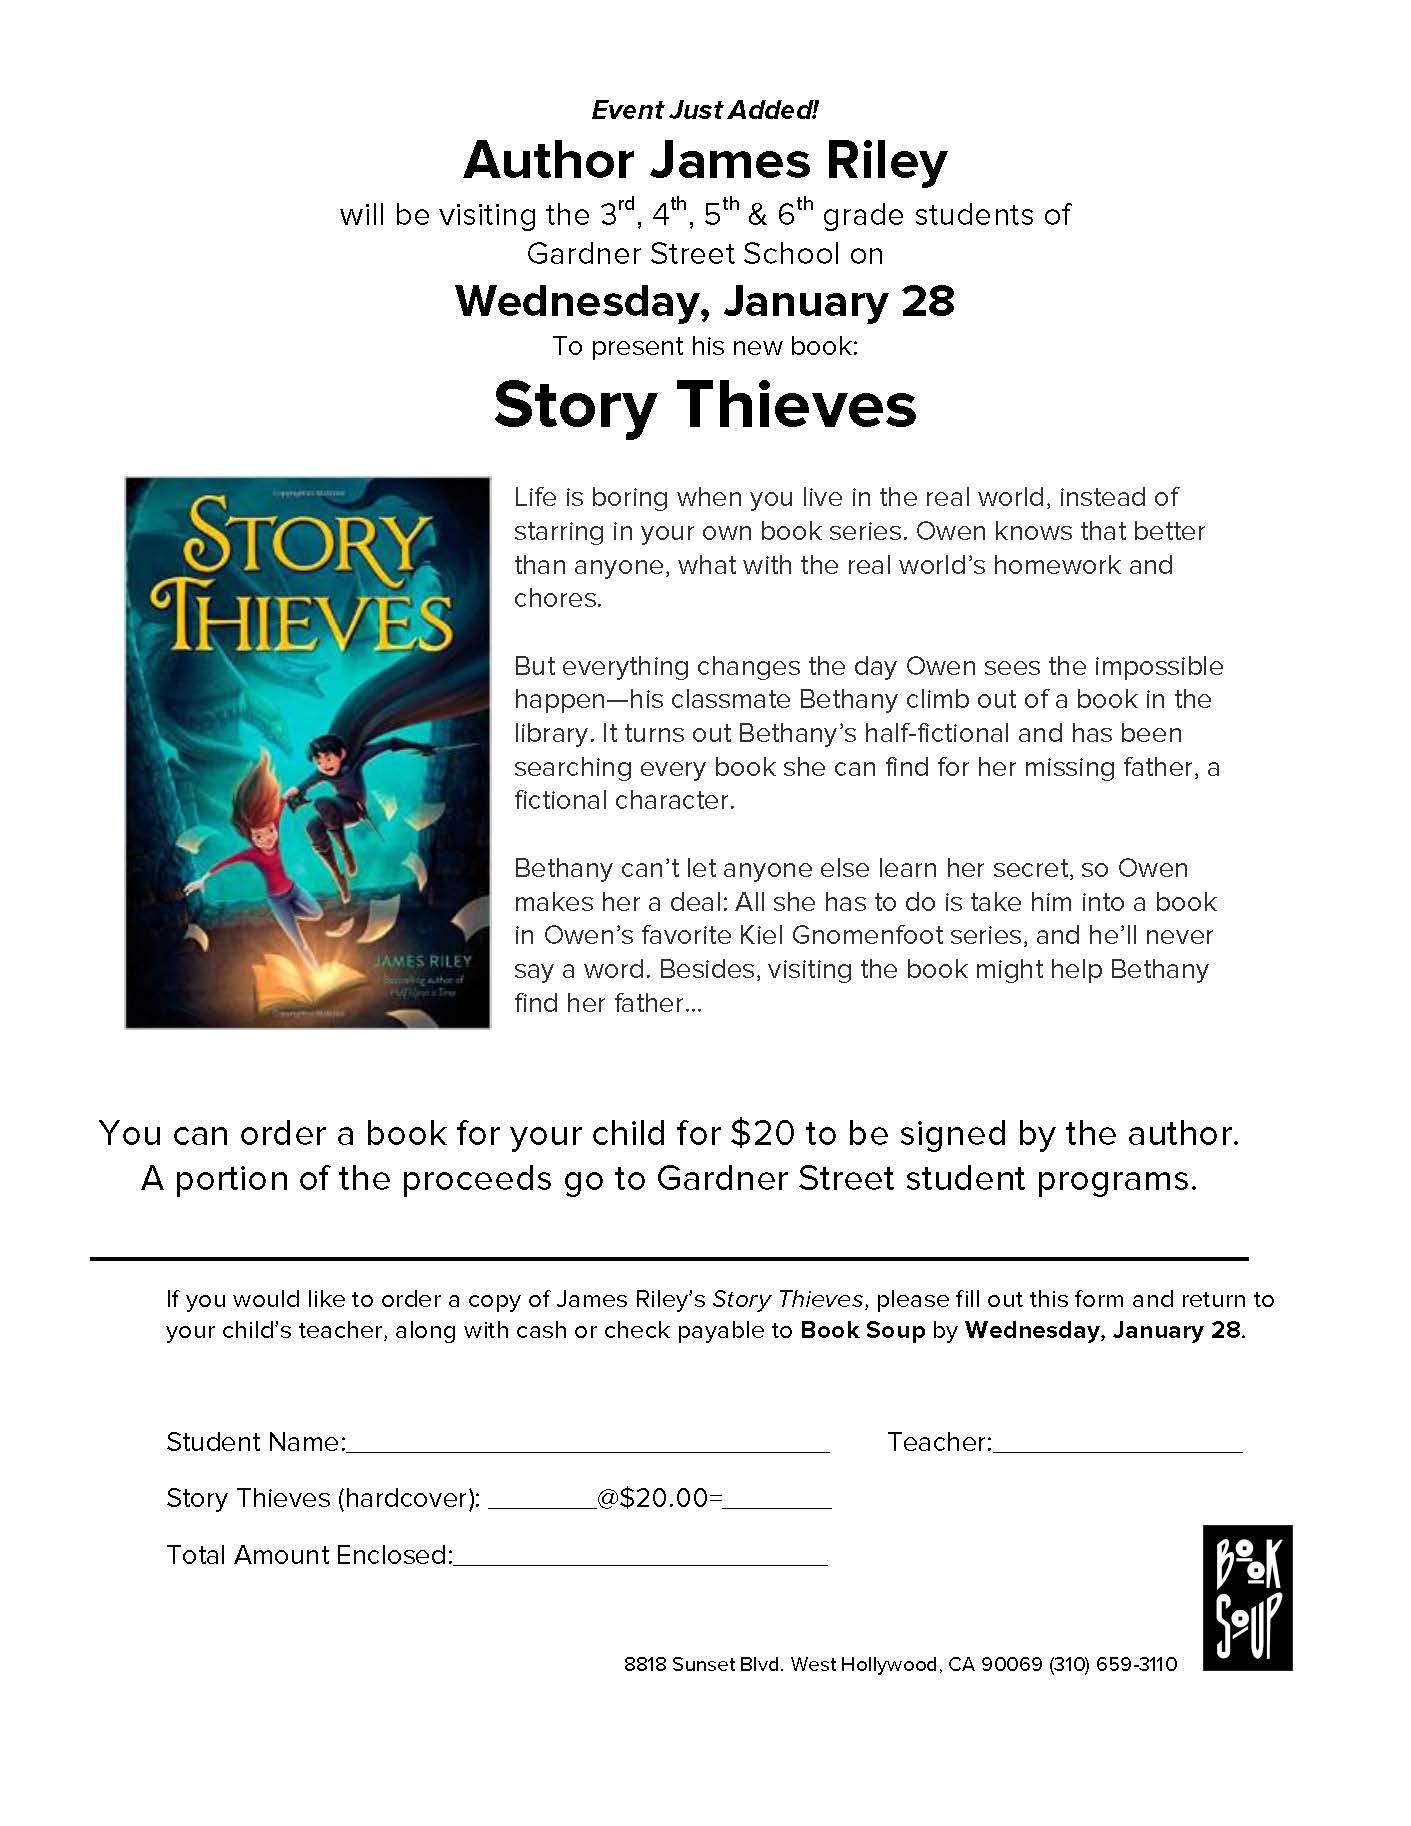 Story Thieves Flyer.jpg